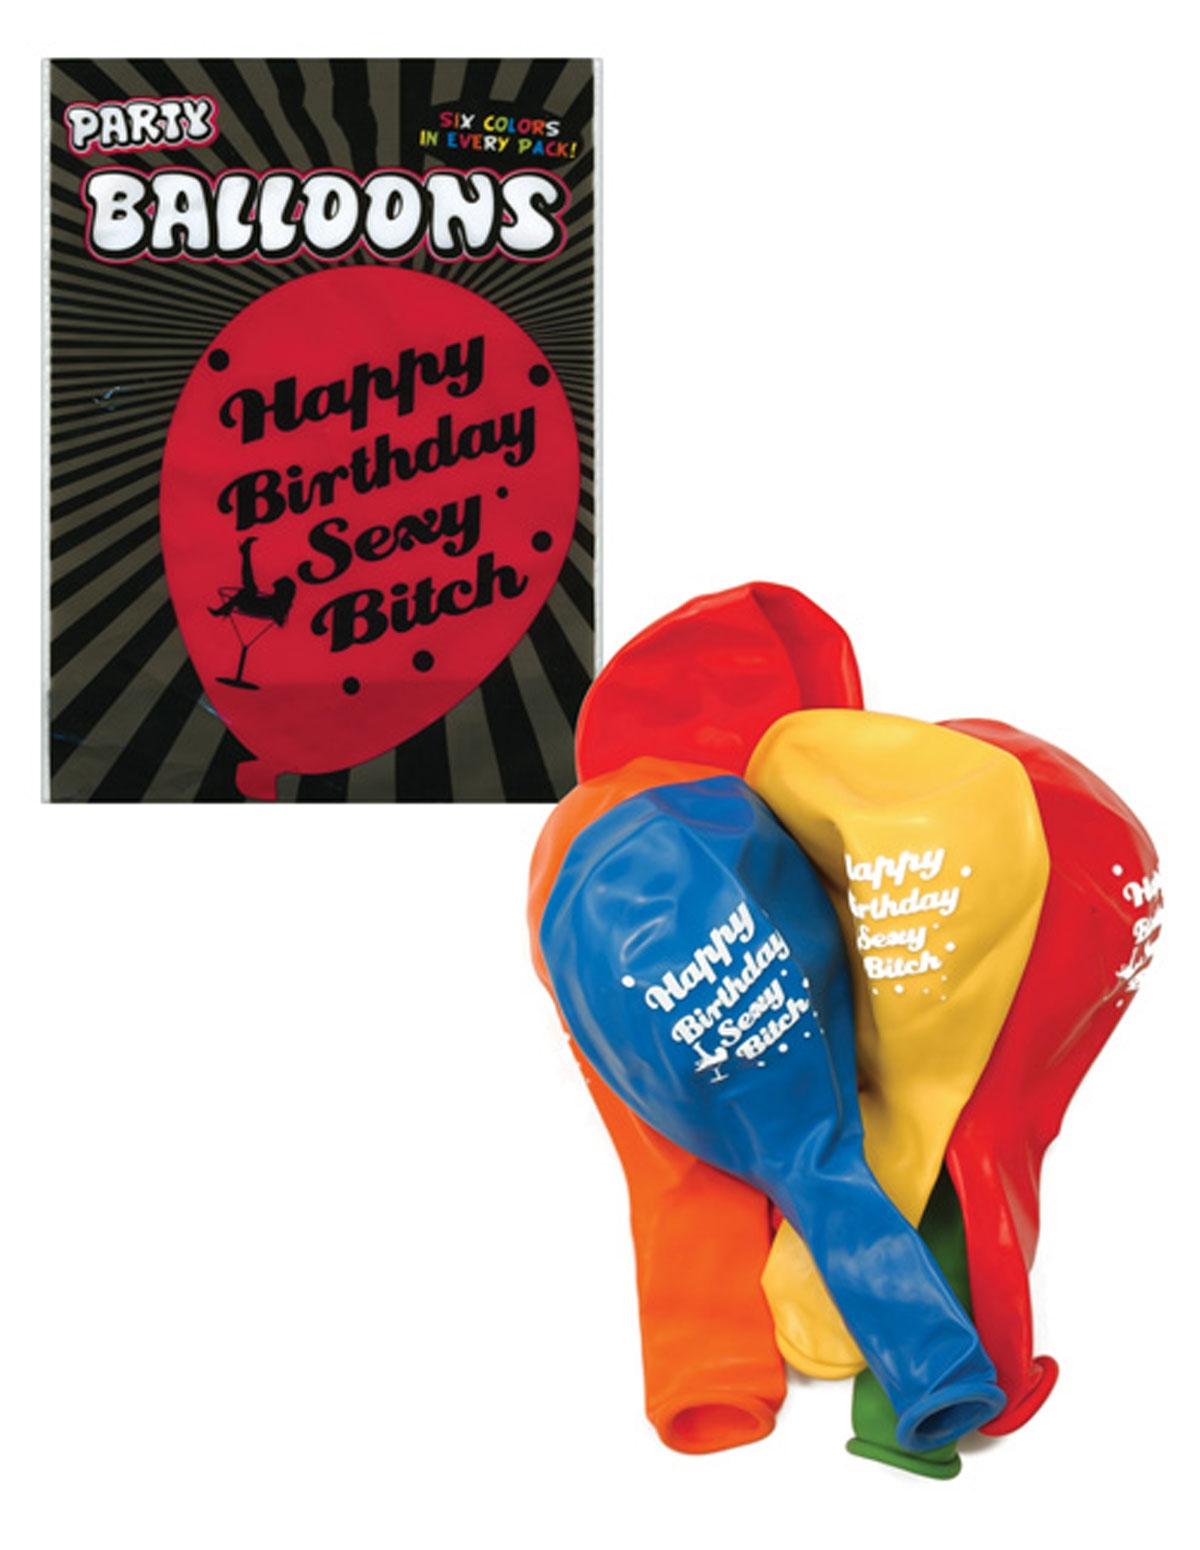 Sexy Bitch Birthday Balloons